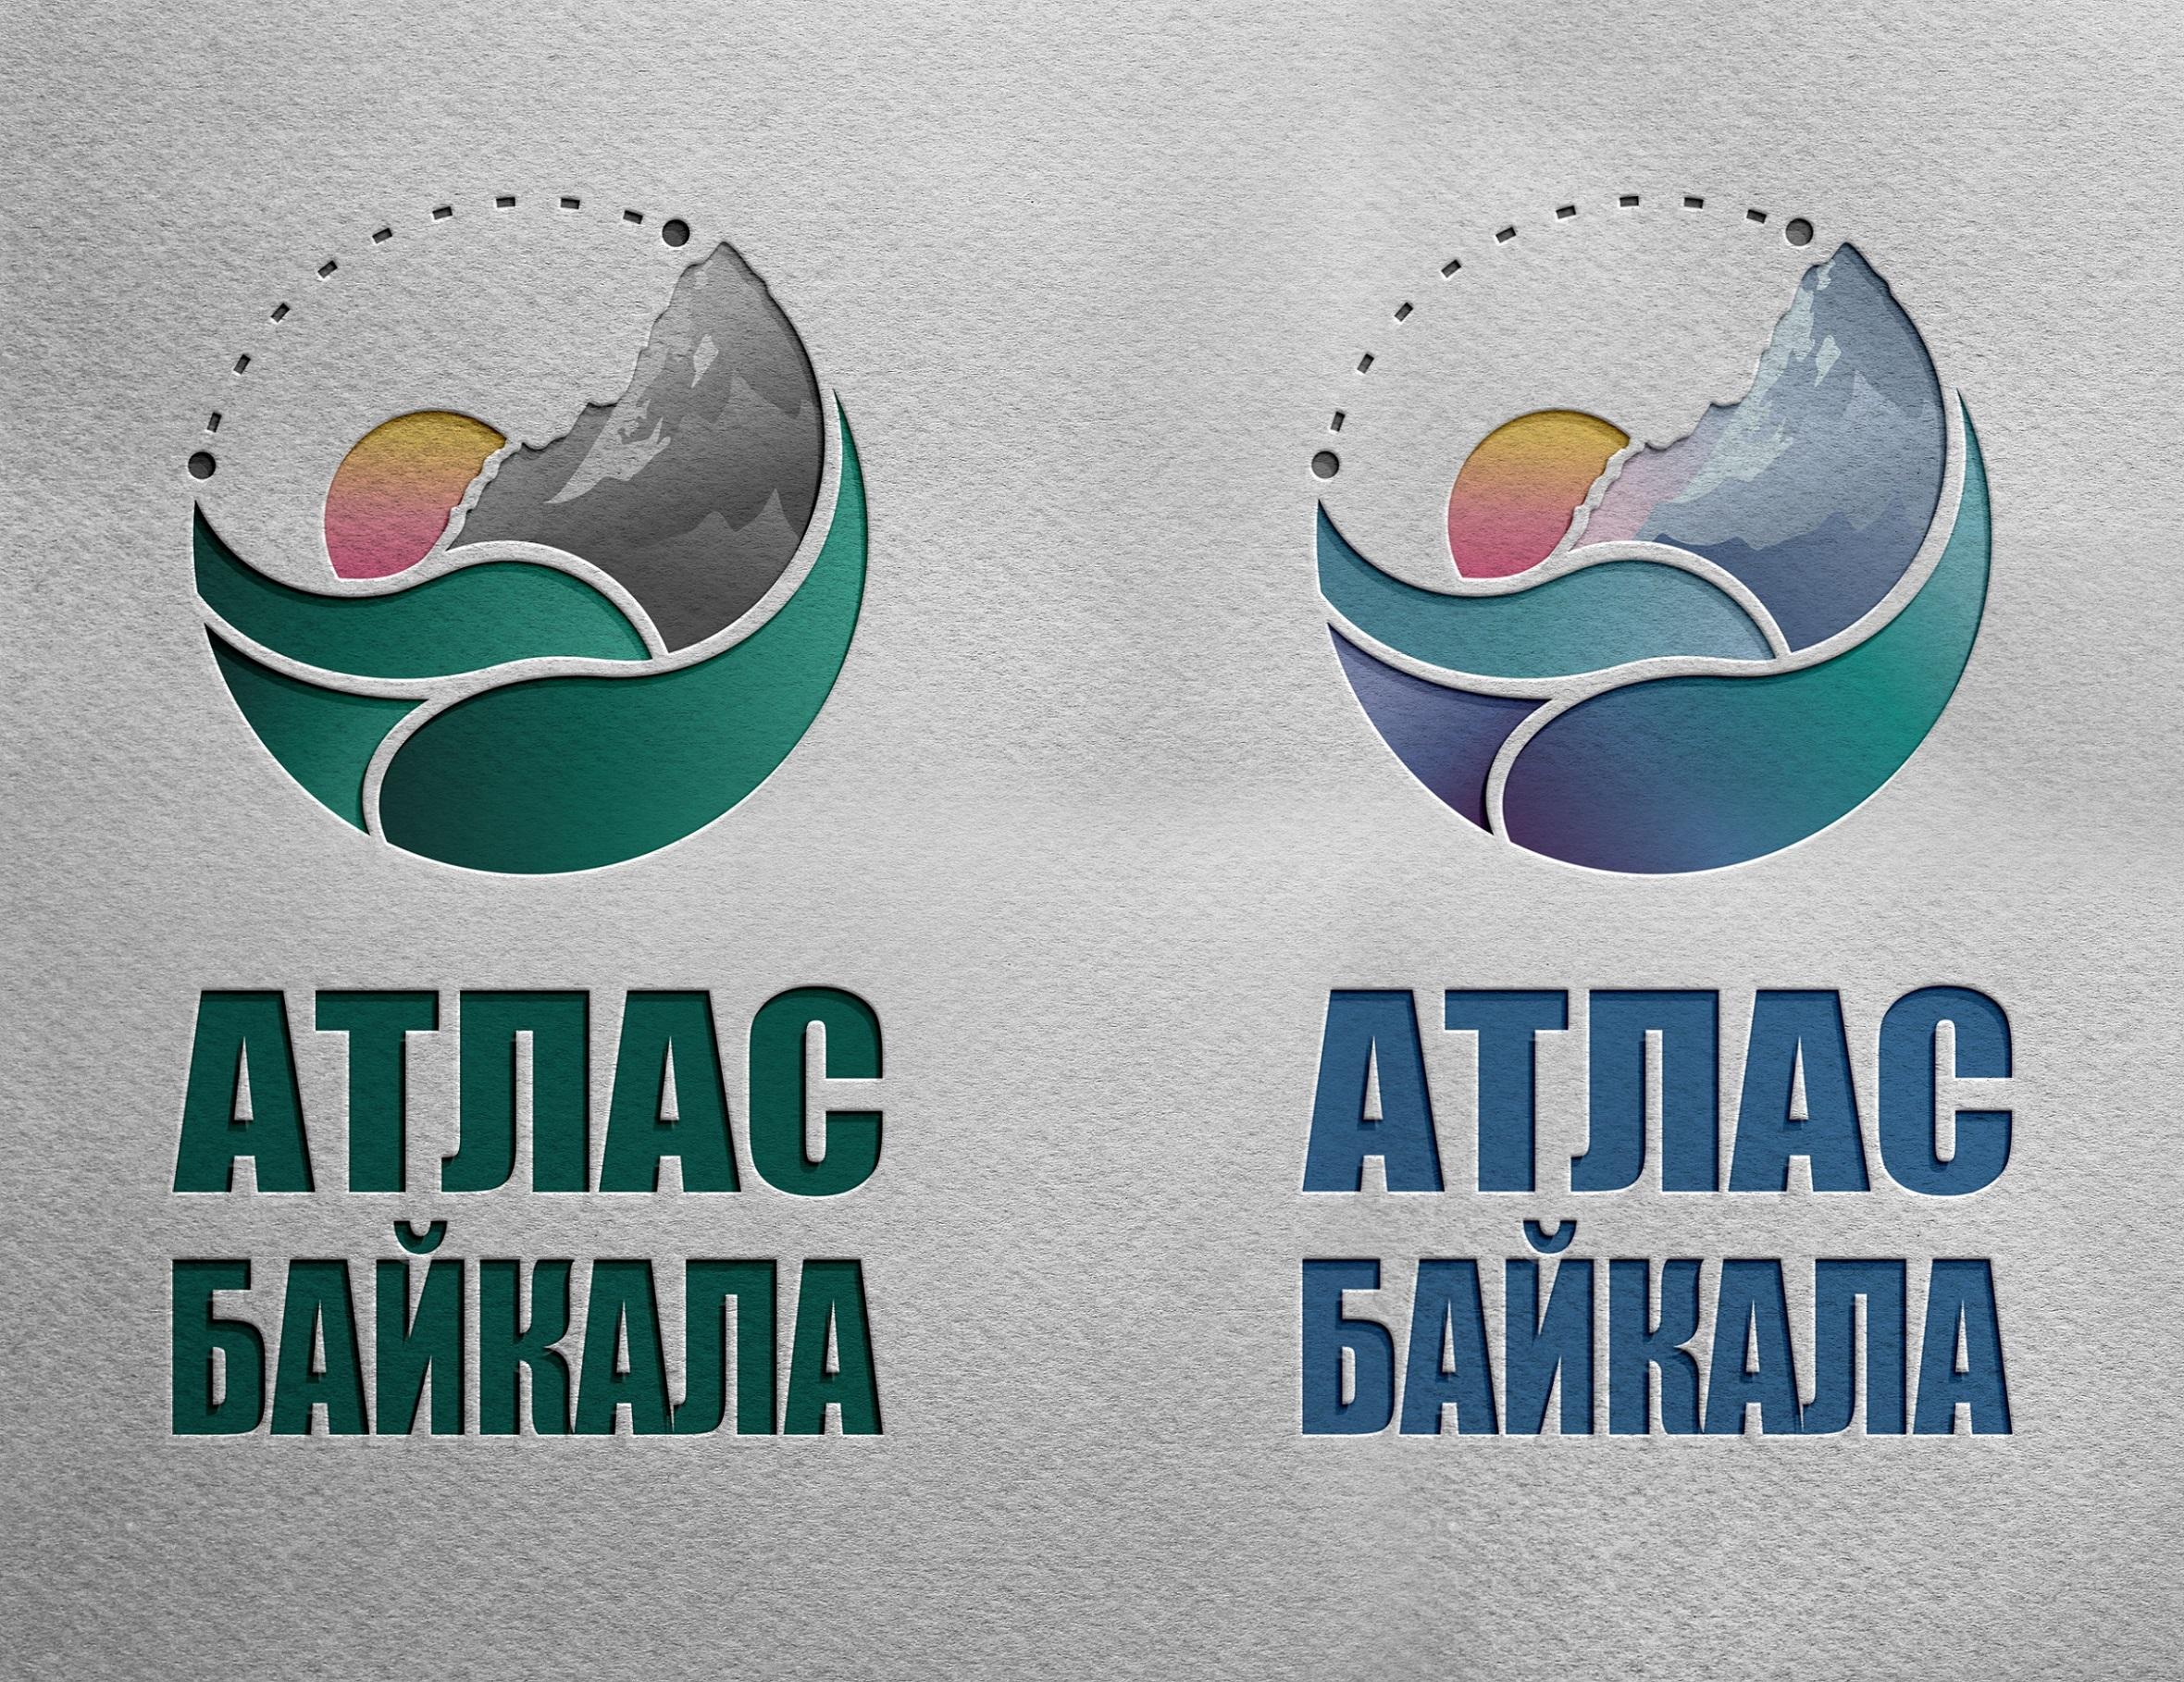 Разработка логотипа Атлас Байкала фото f_4315b1aab19be9b0.jpg